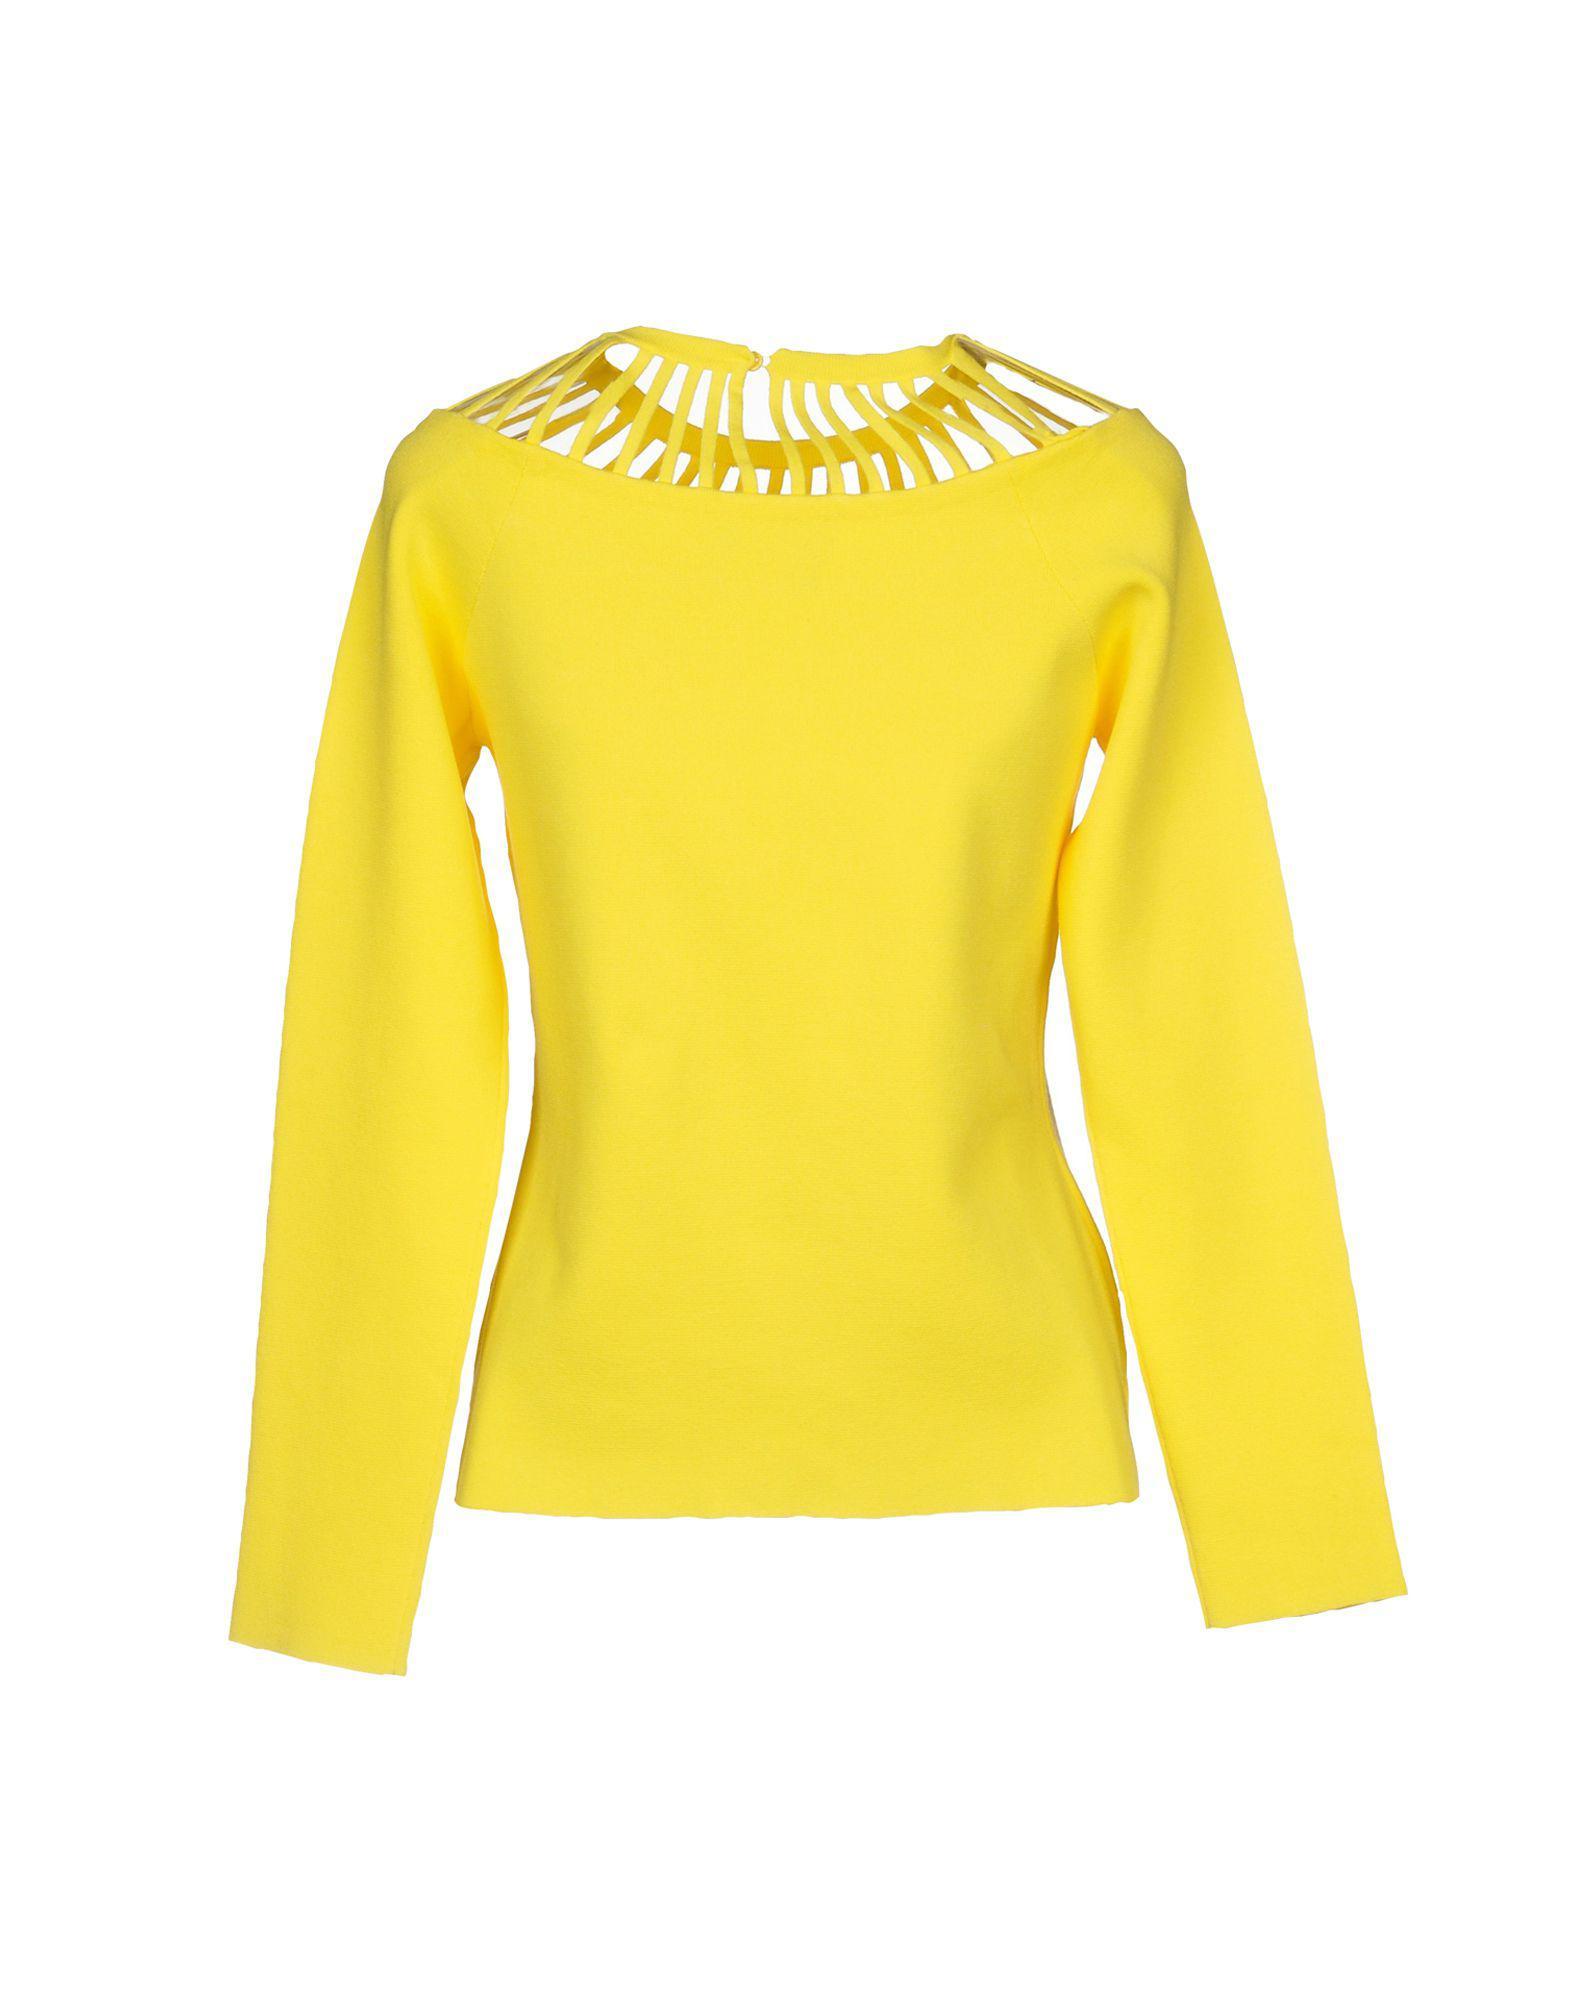 Pullover Synthétique Boutique Moschino en coloris Jaune